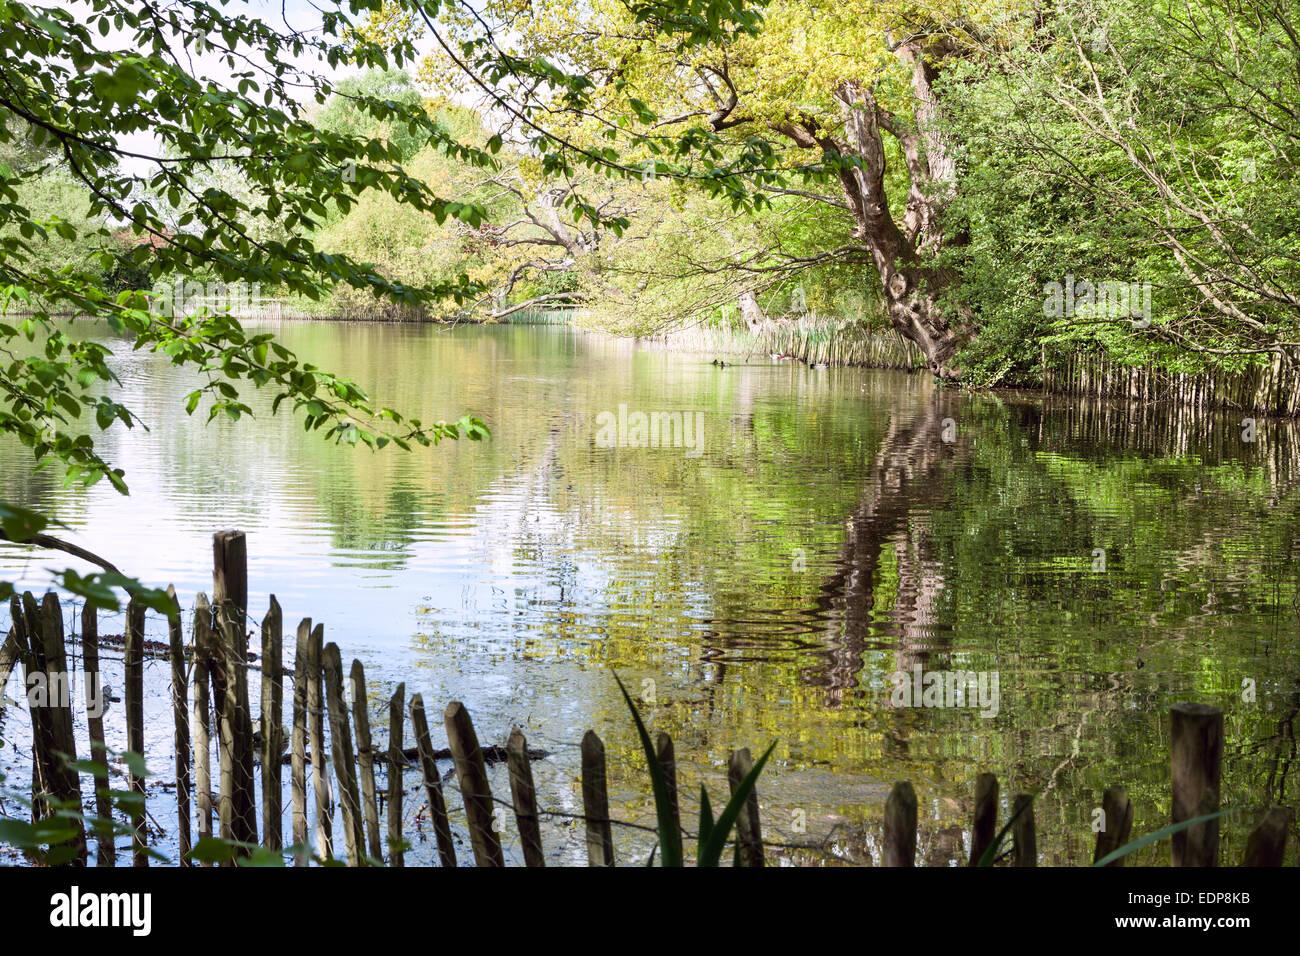 A beautiful lake - Danbury Country Park - UK - Stock Image